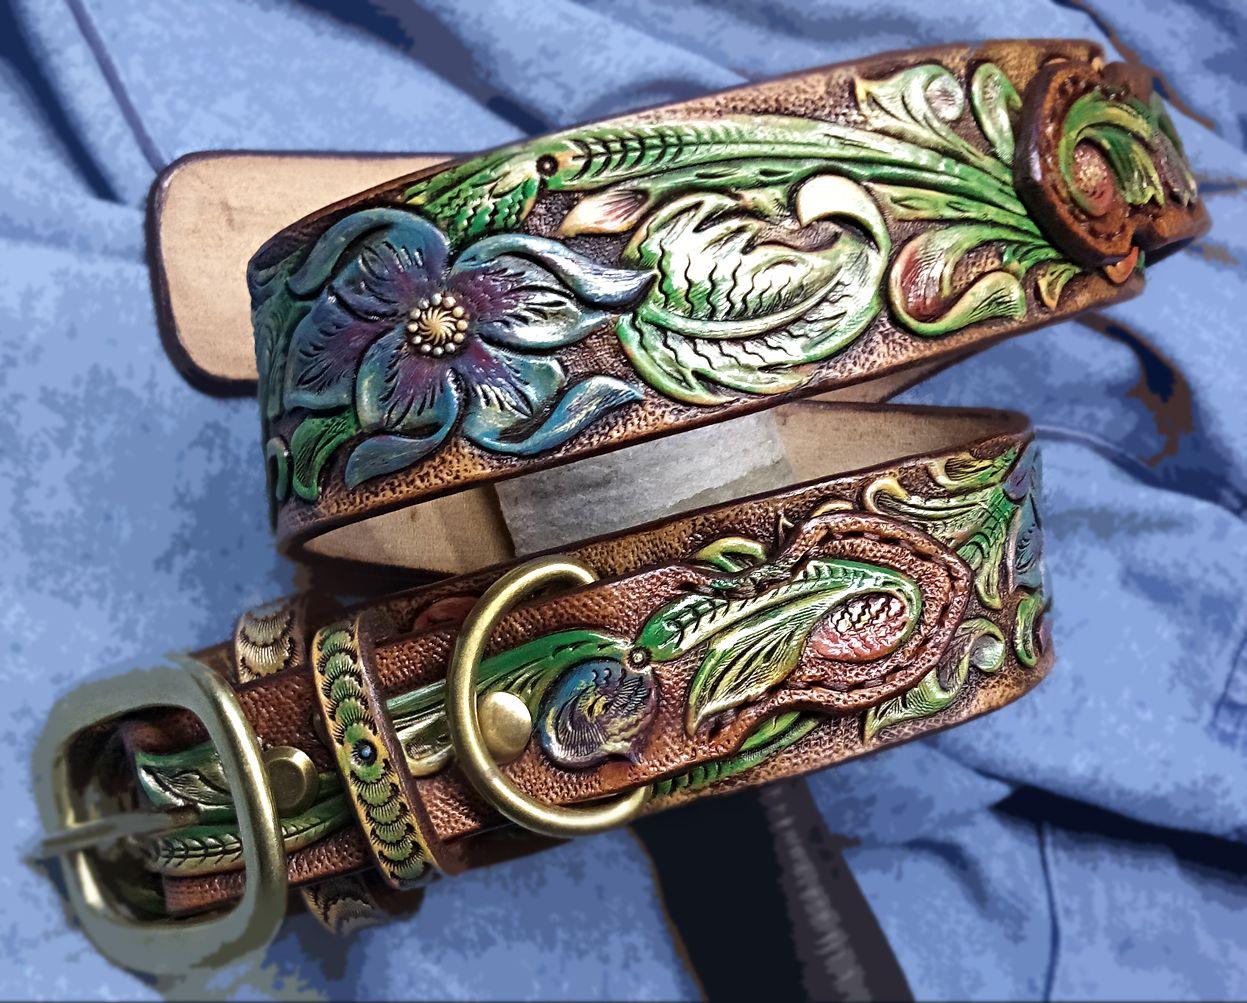 bdf12faded20 Buy Custom Dog Collar Ranger Hand Tooled, Hand Carved, Big Flowers ...